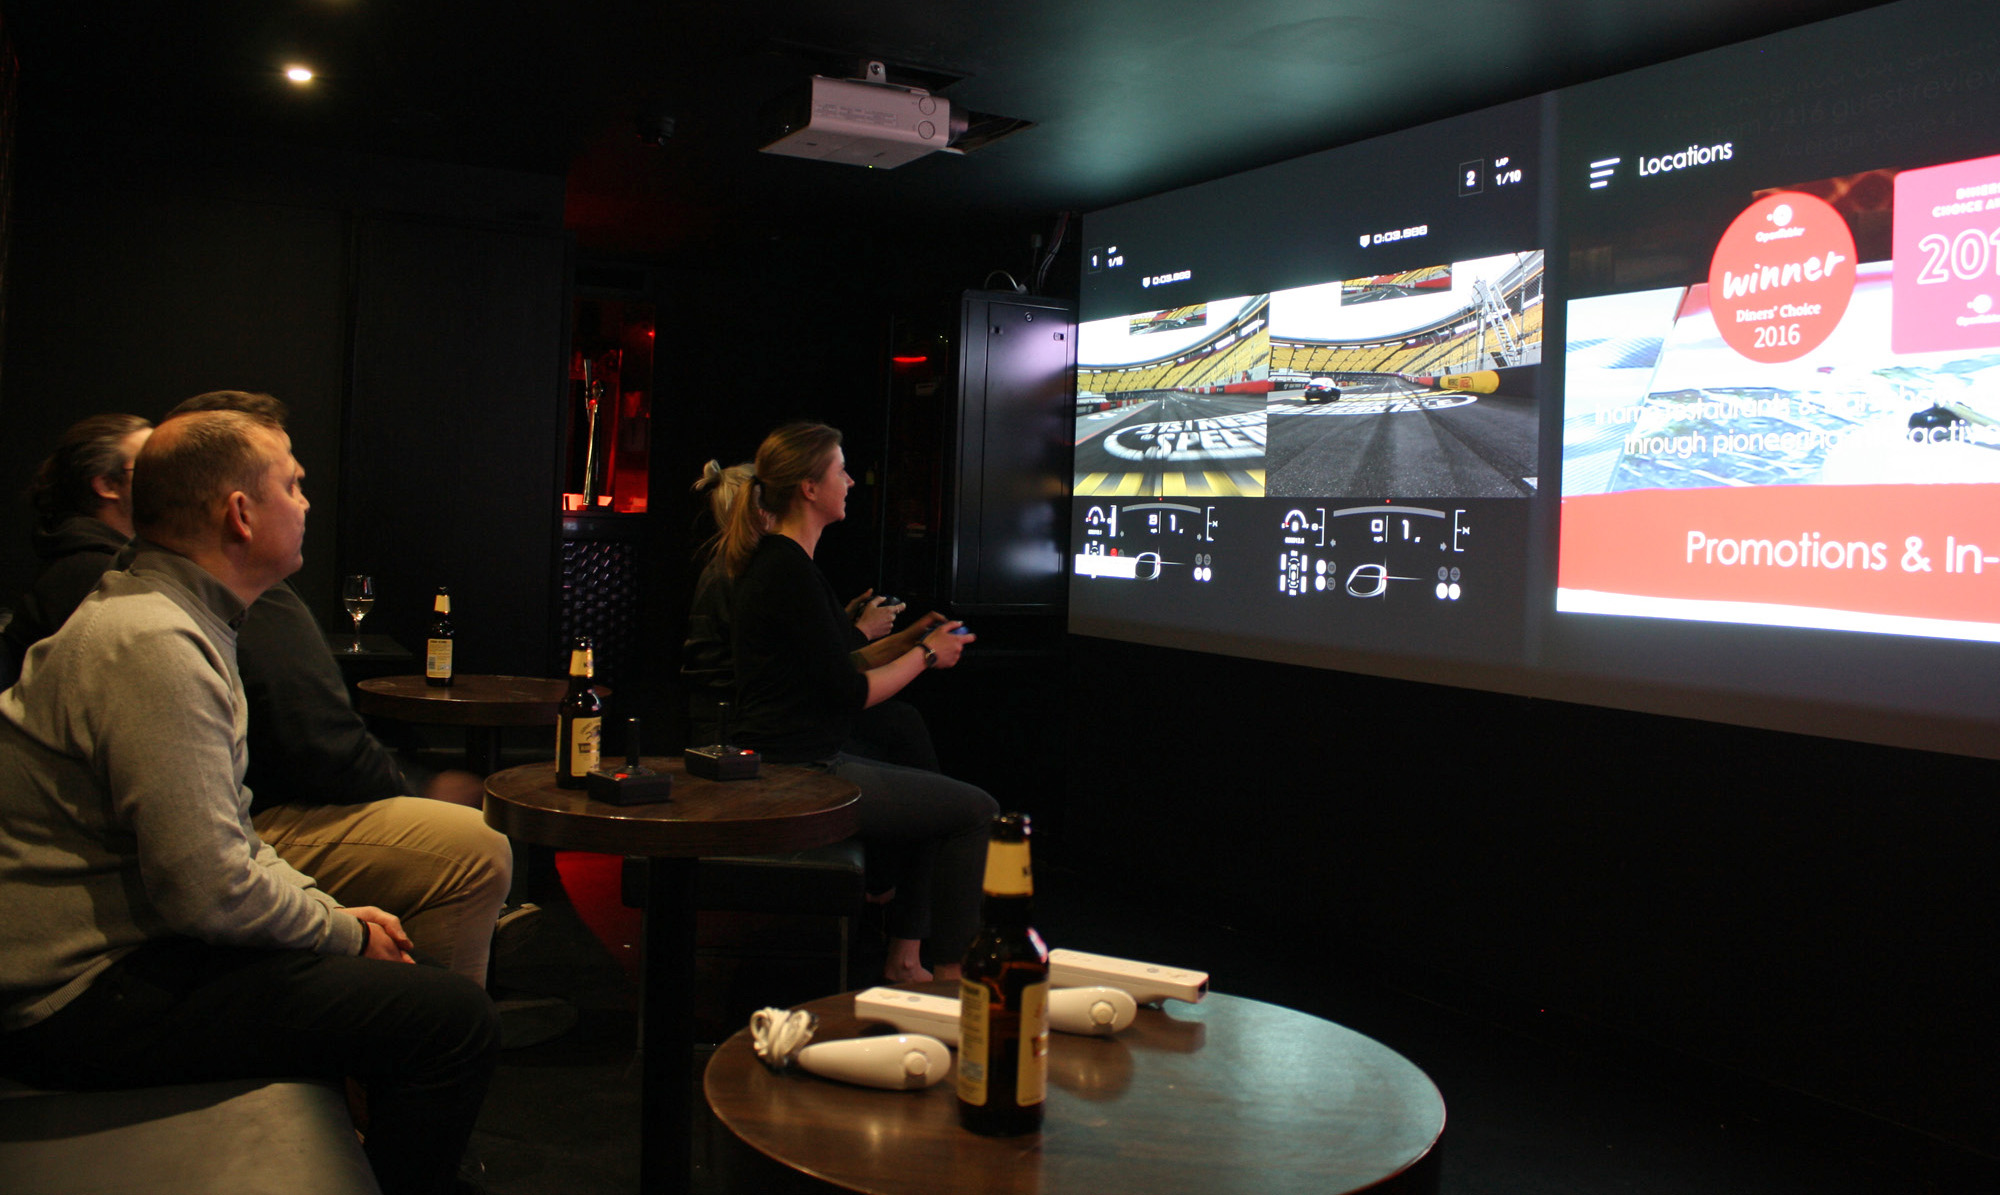 Inamo Soho london restaurants foodie tech games room guests